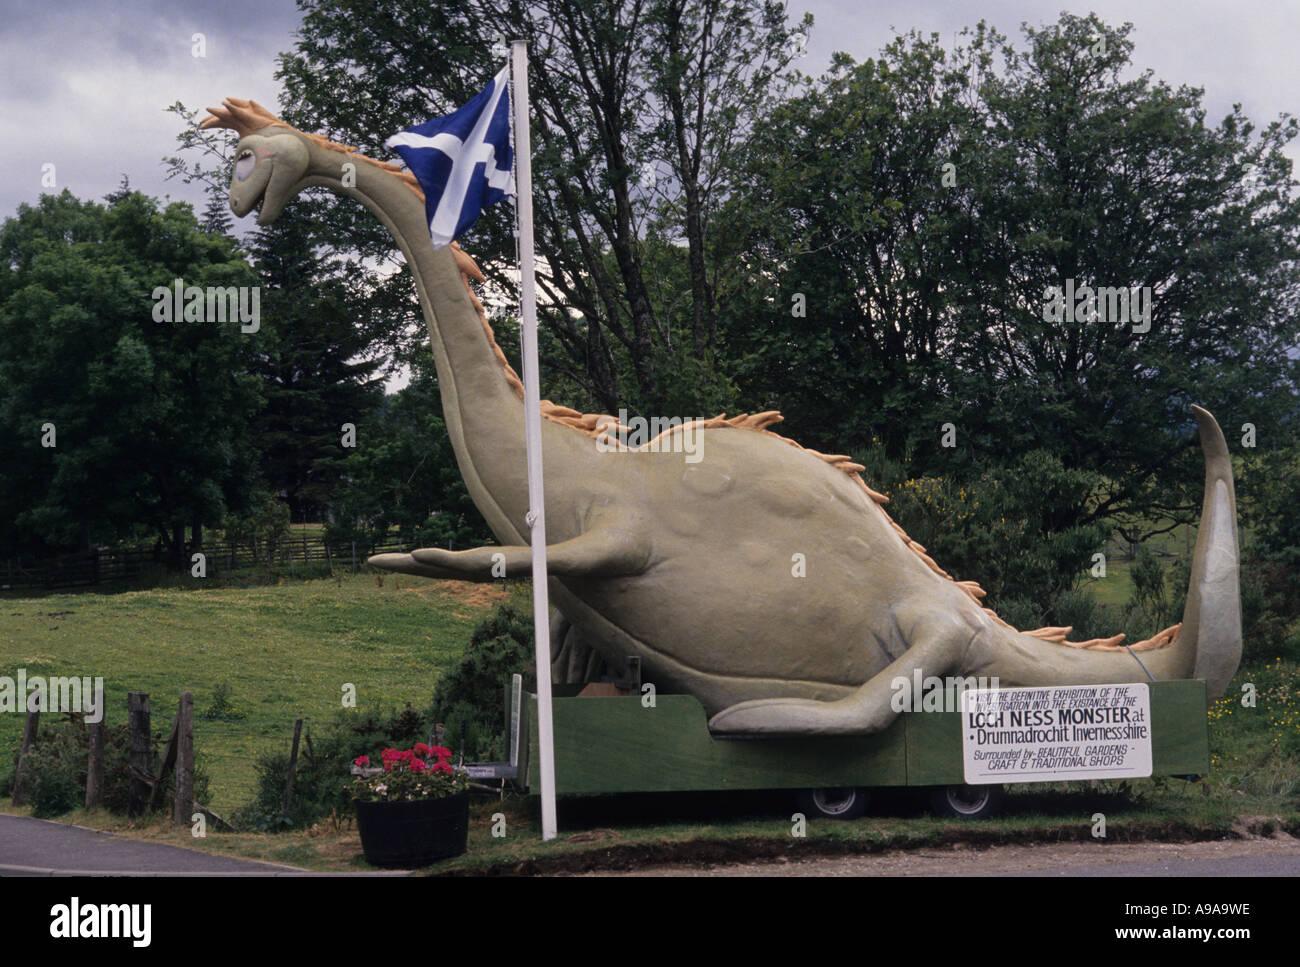 Scotland Loch Ness monster Nessie - Stock Image